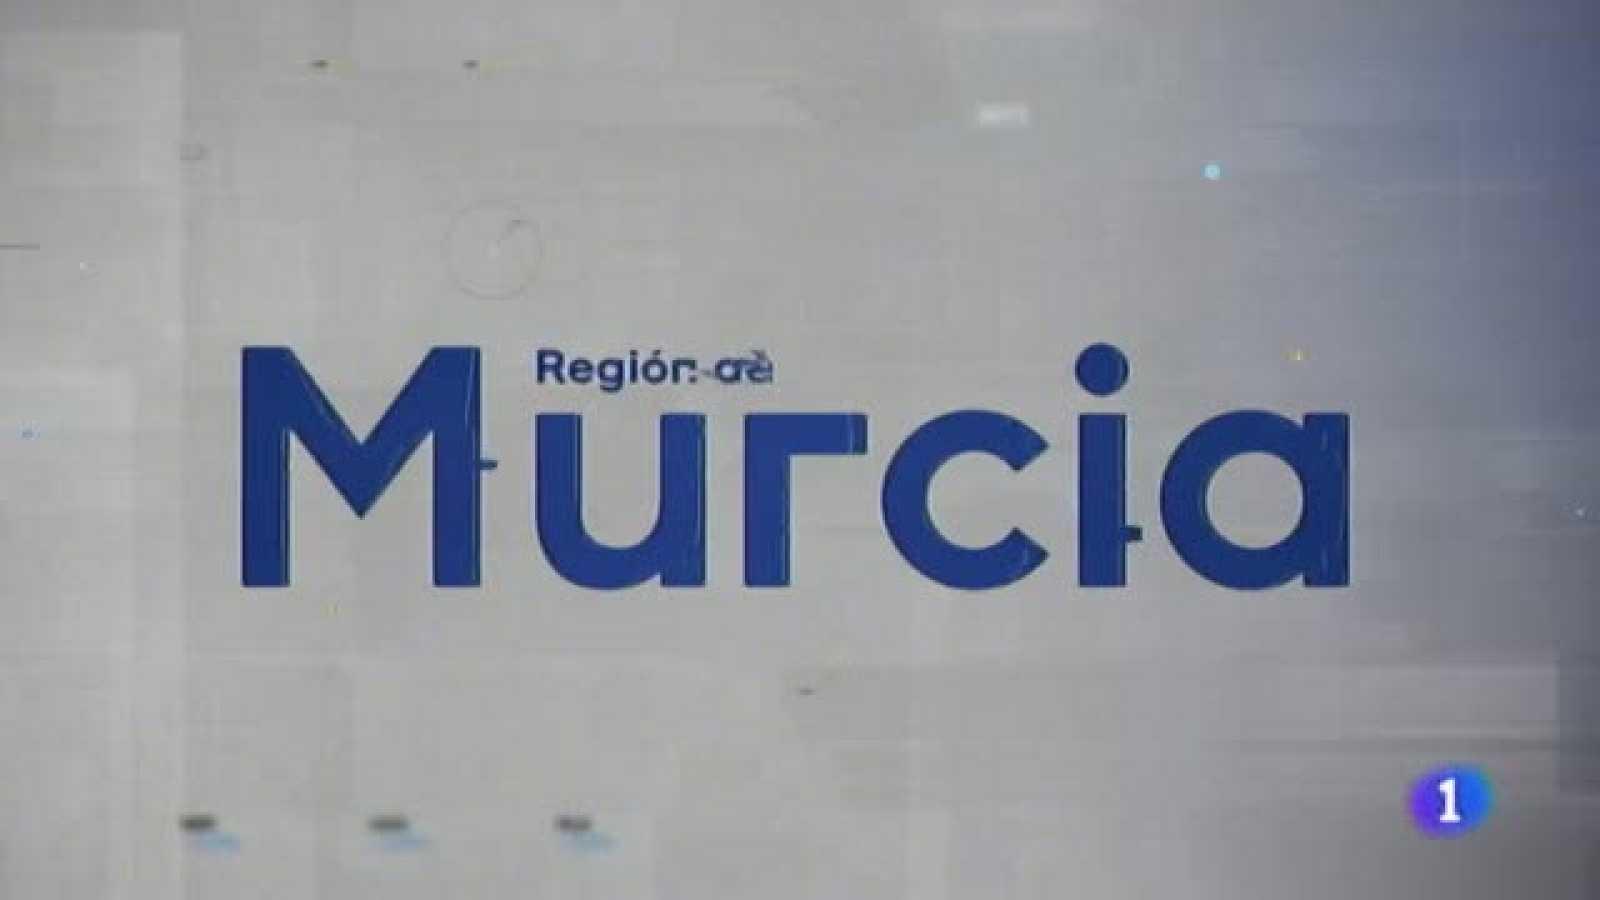 Noticias Murcia - 09/04/2021